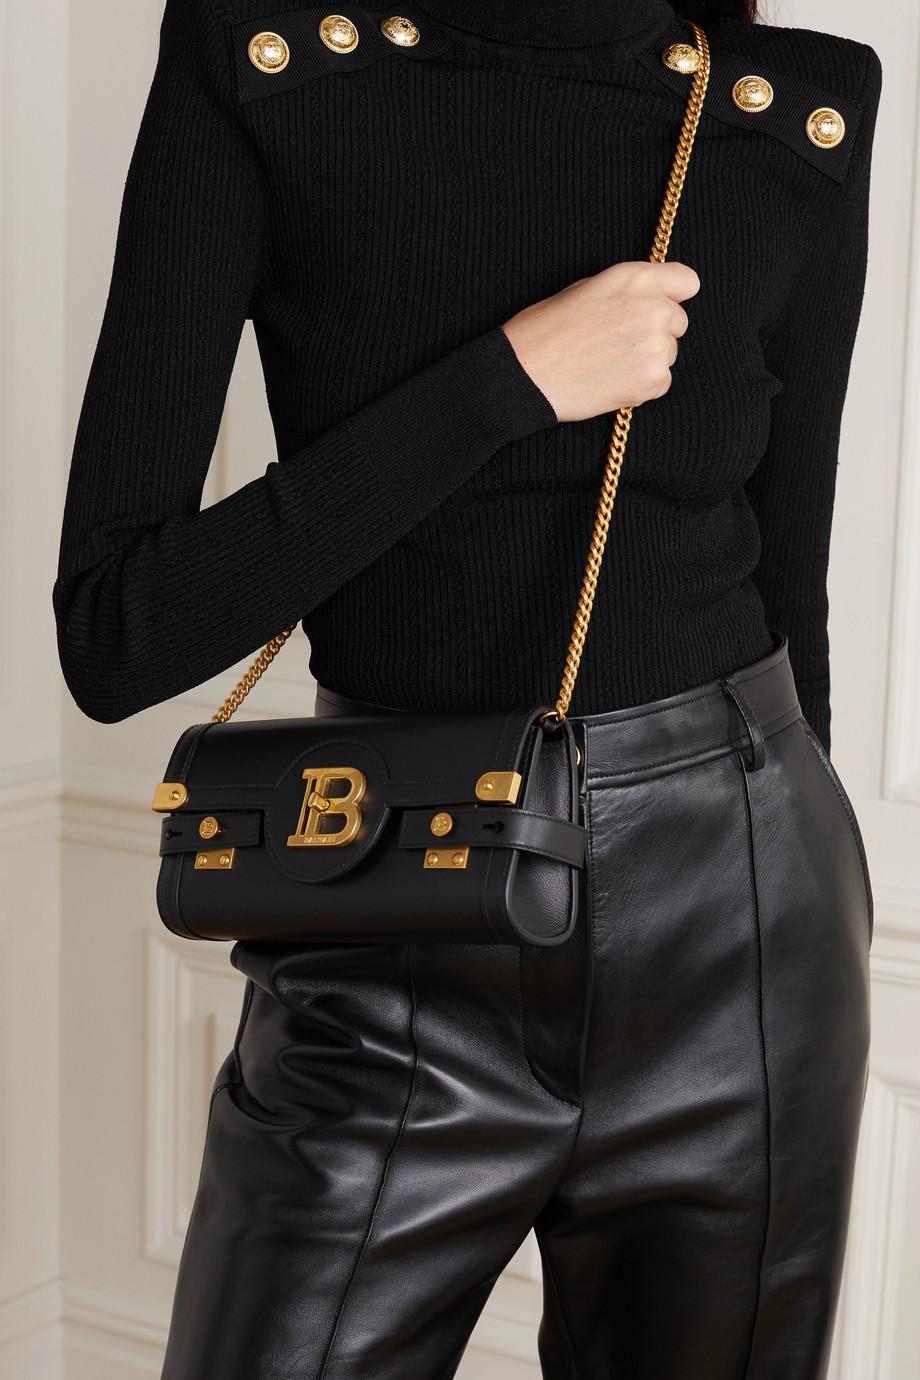 Balmain B-Buzz leather shoulder bag